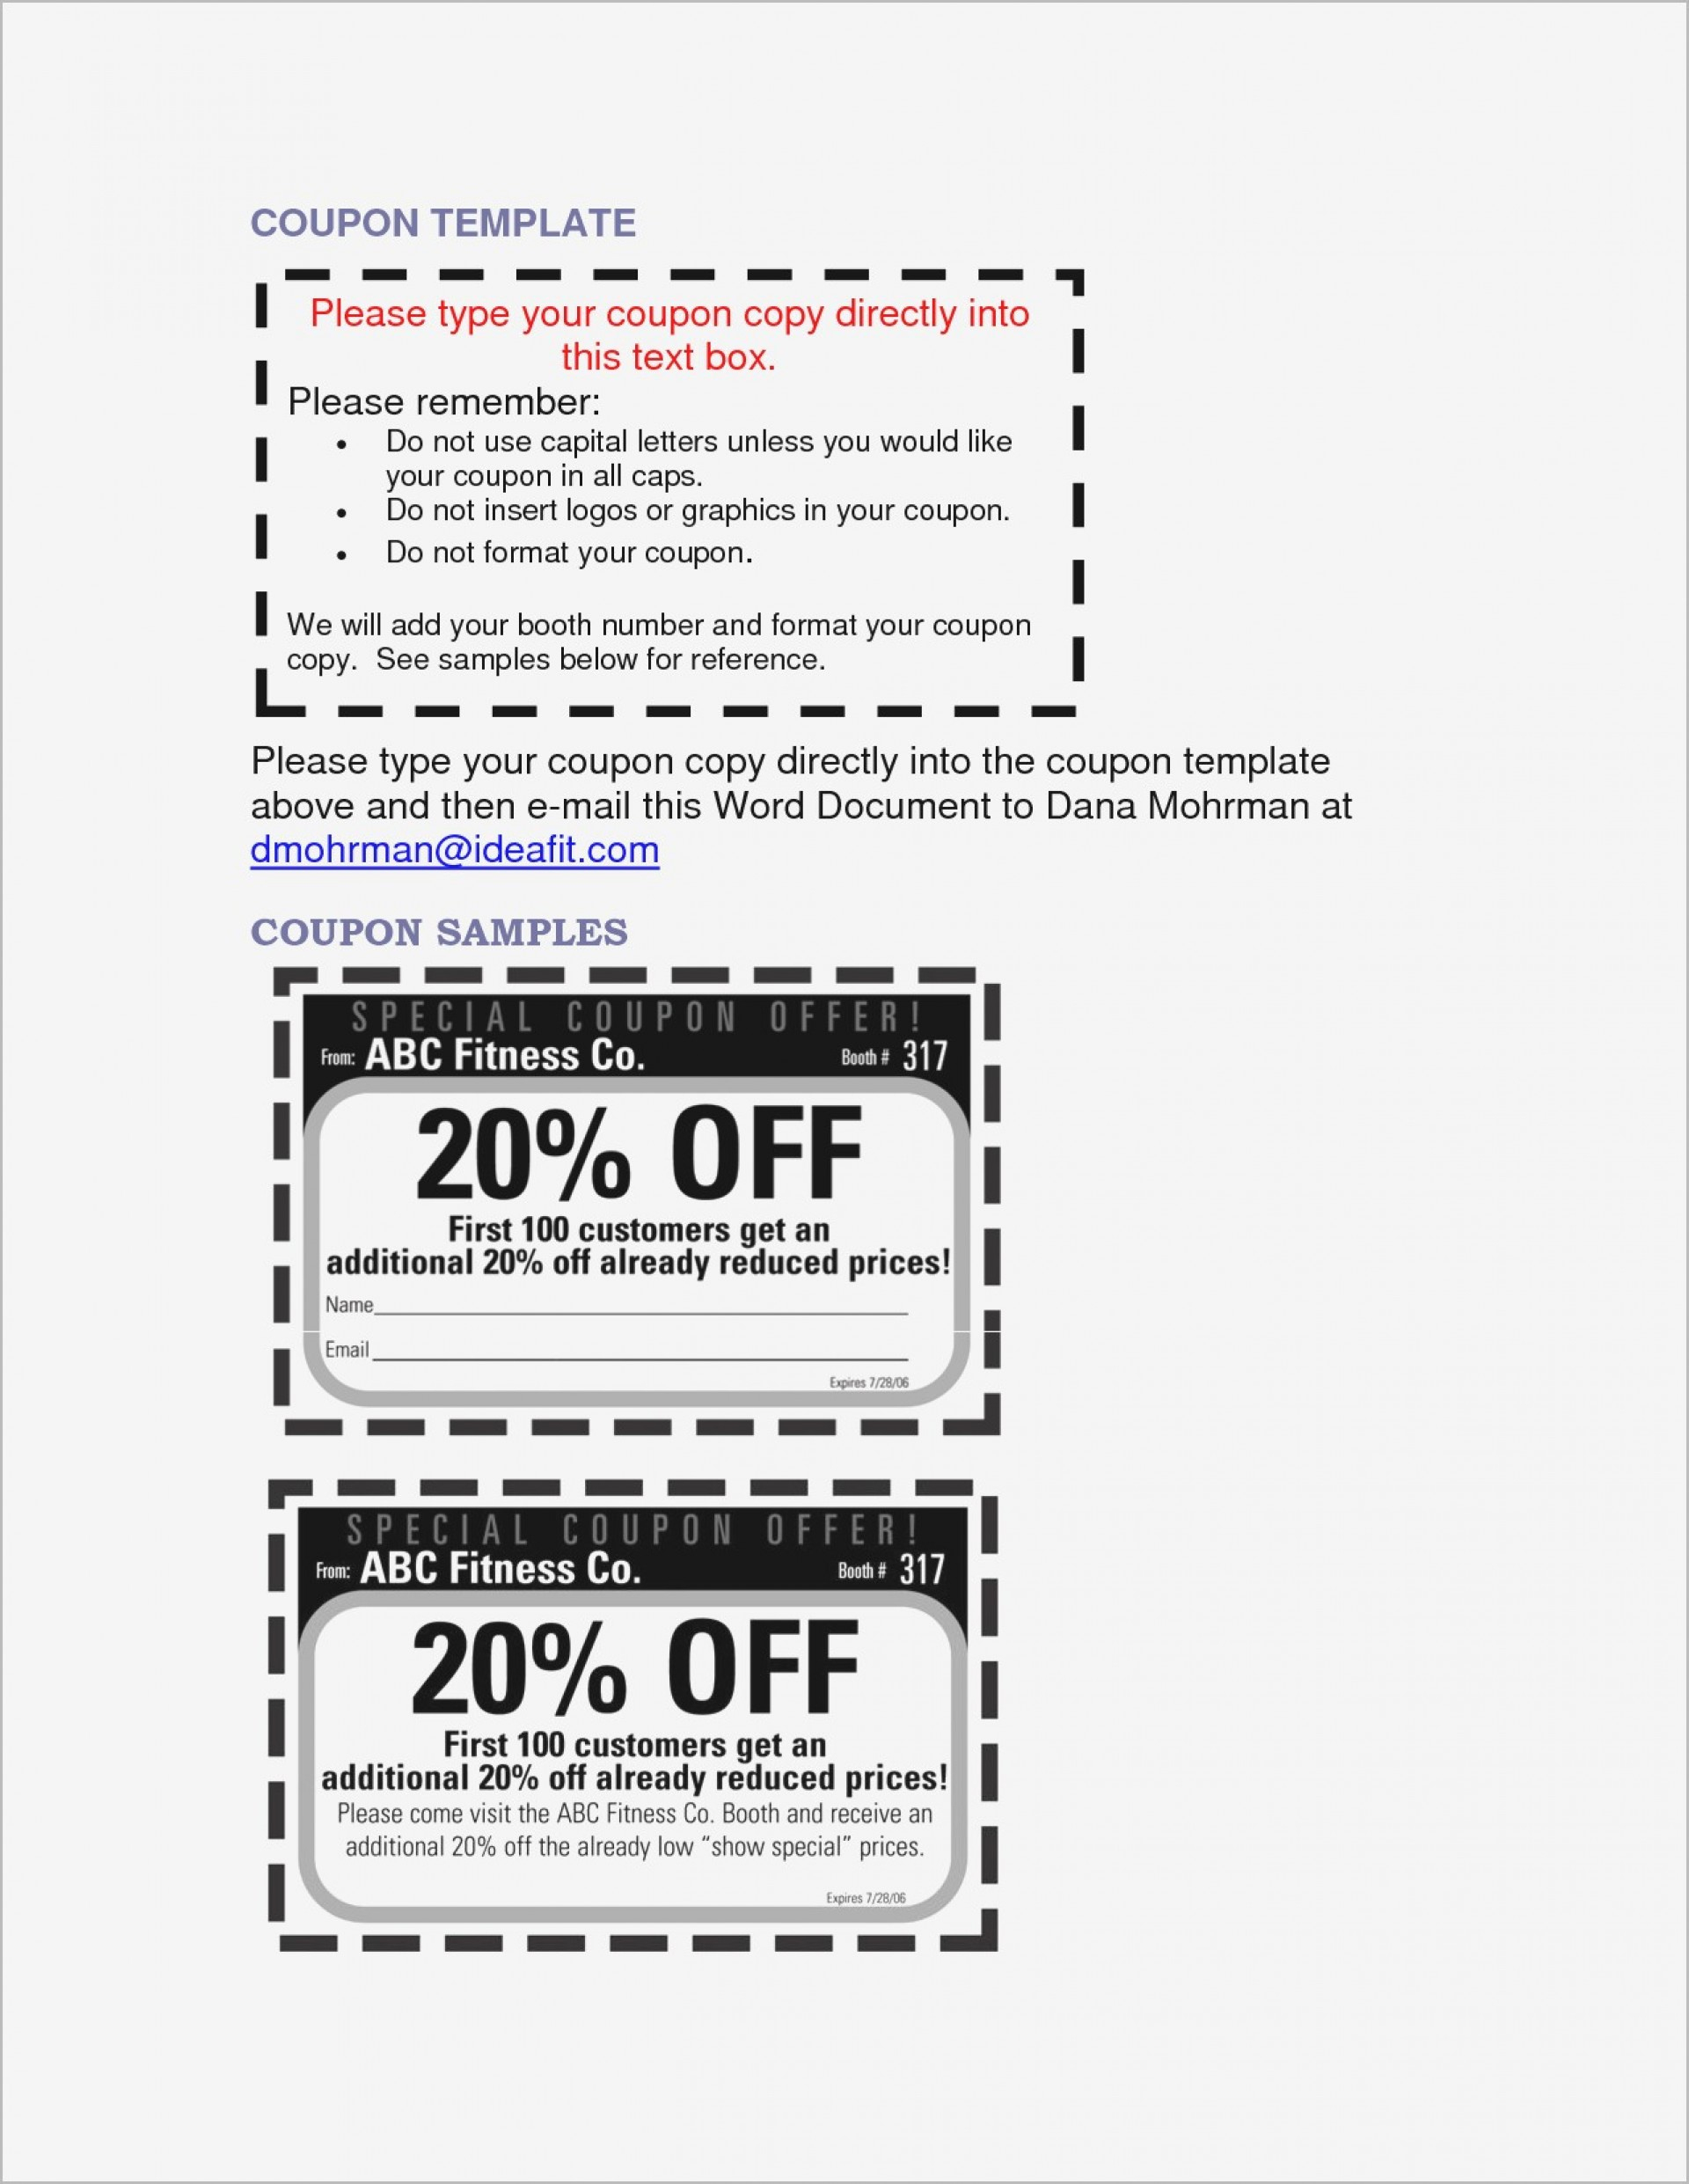 010 Make Your Own Coupon Template Free Printable Templates Brochure - Create Your Own Coupon Free Printable